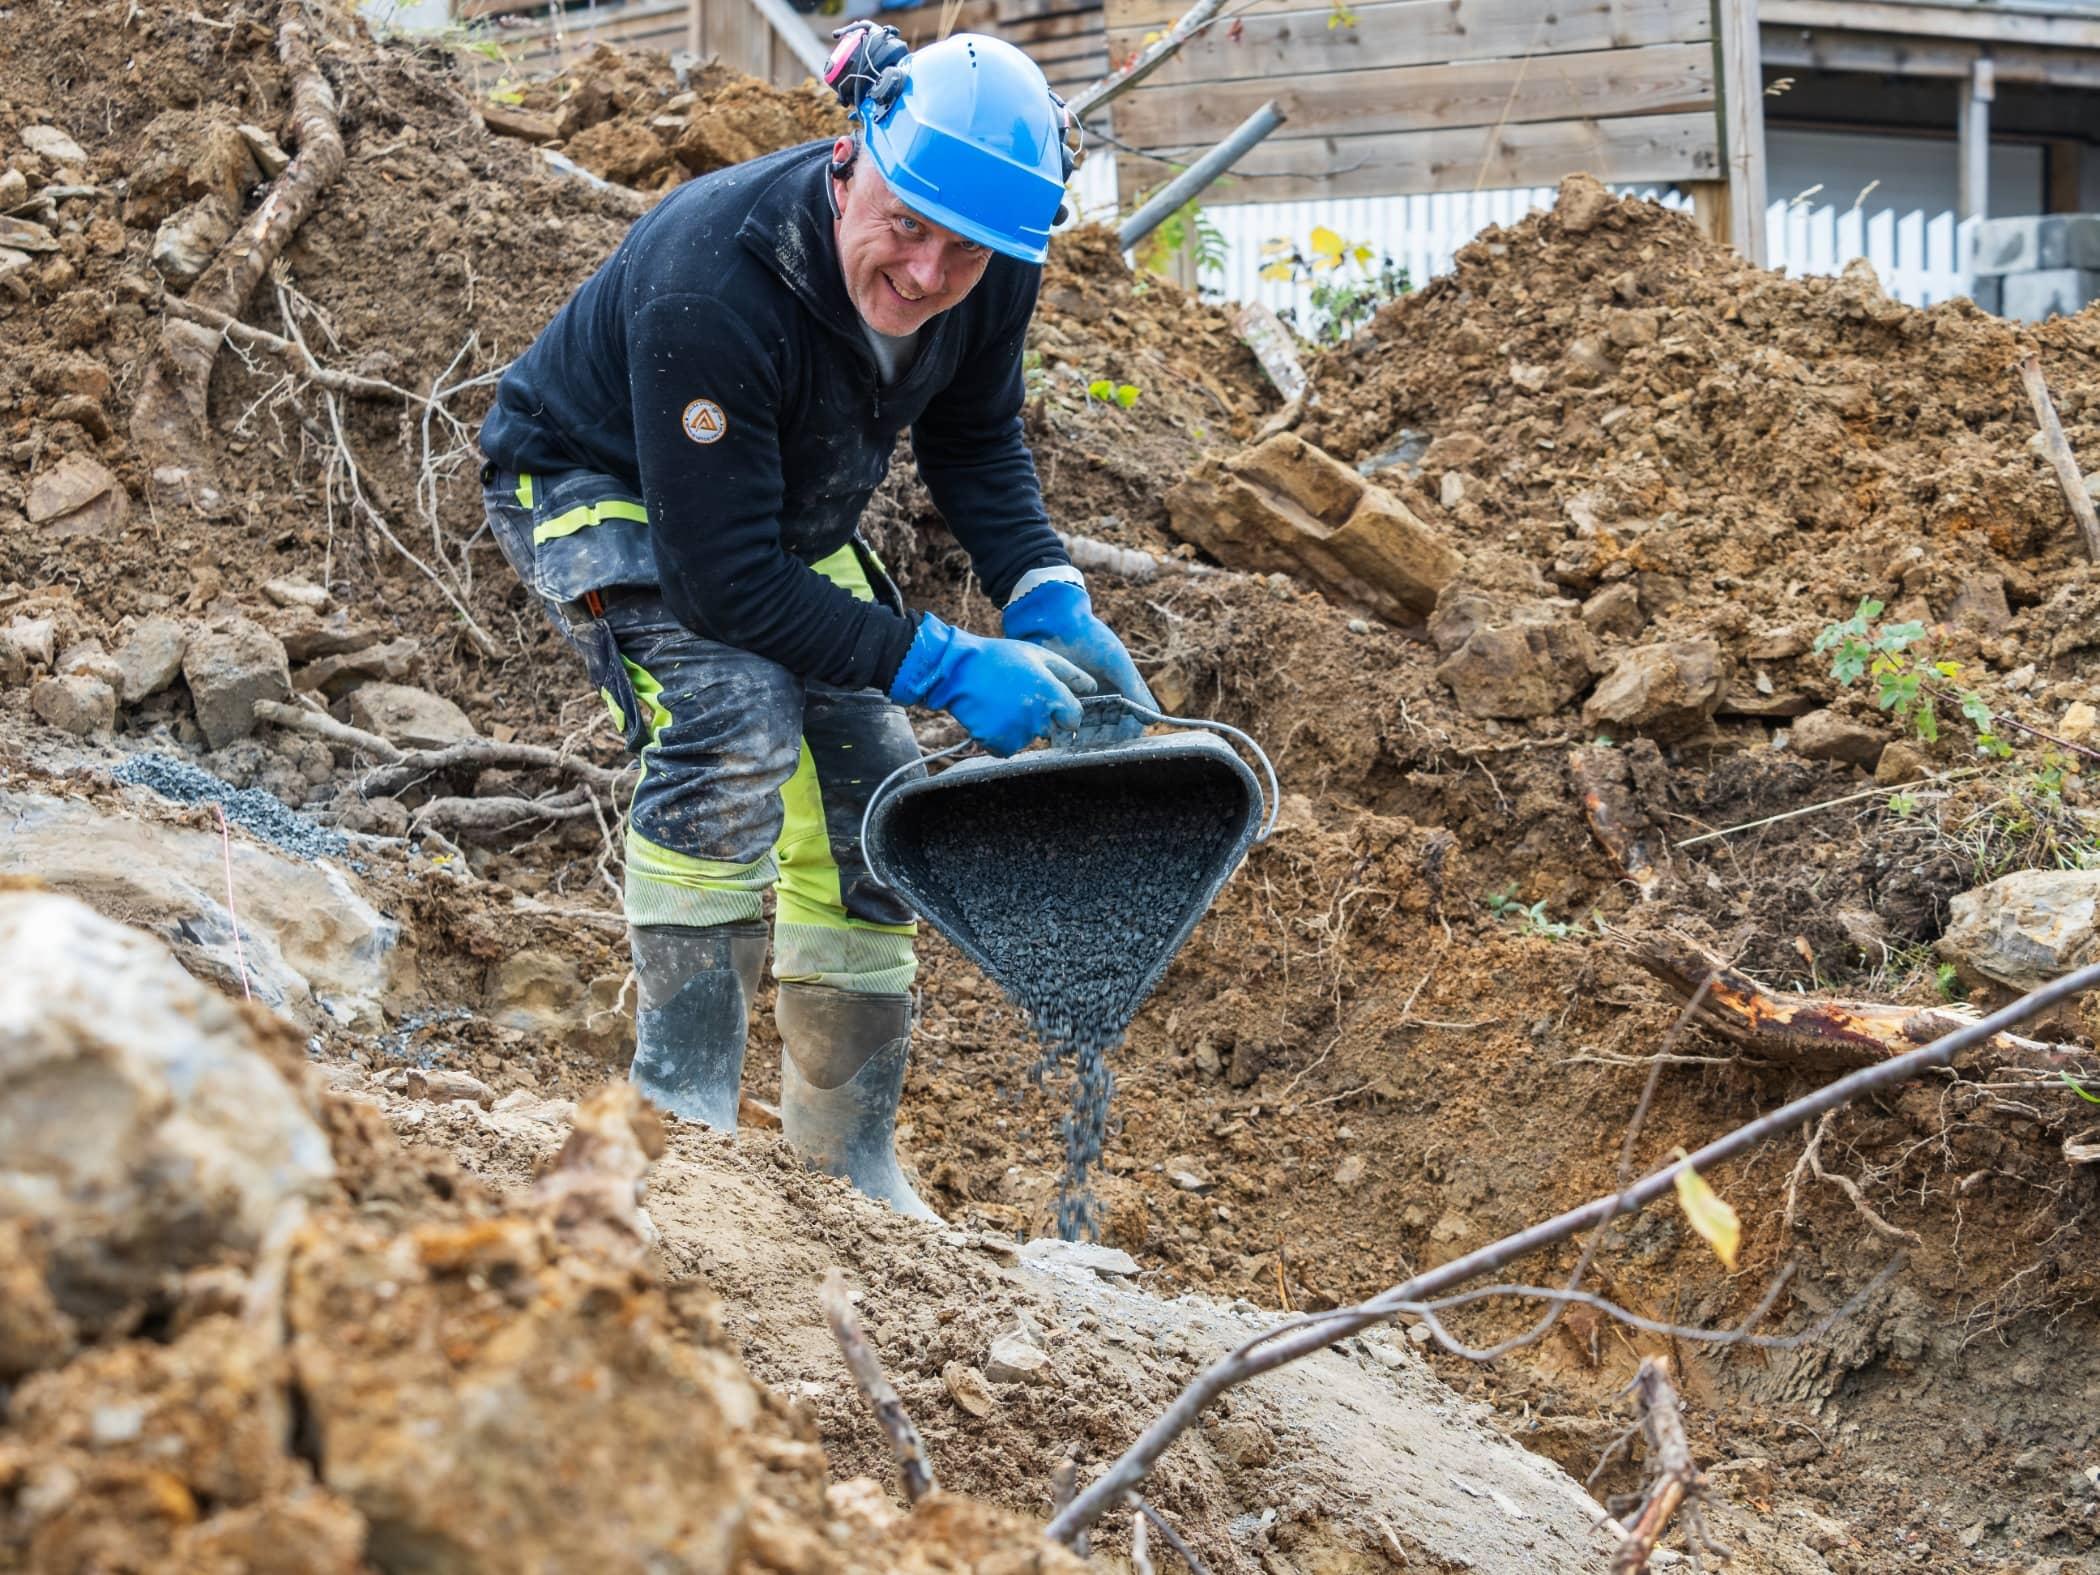 Geological phenomenon, Blue-collar worker, Soil